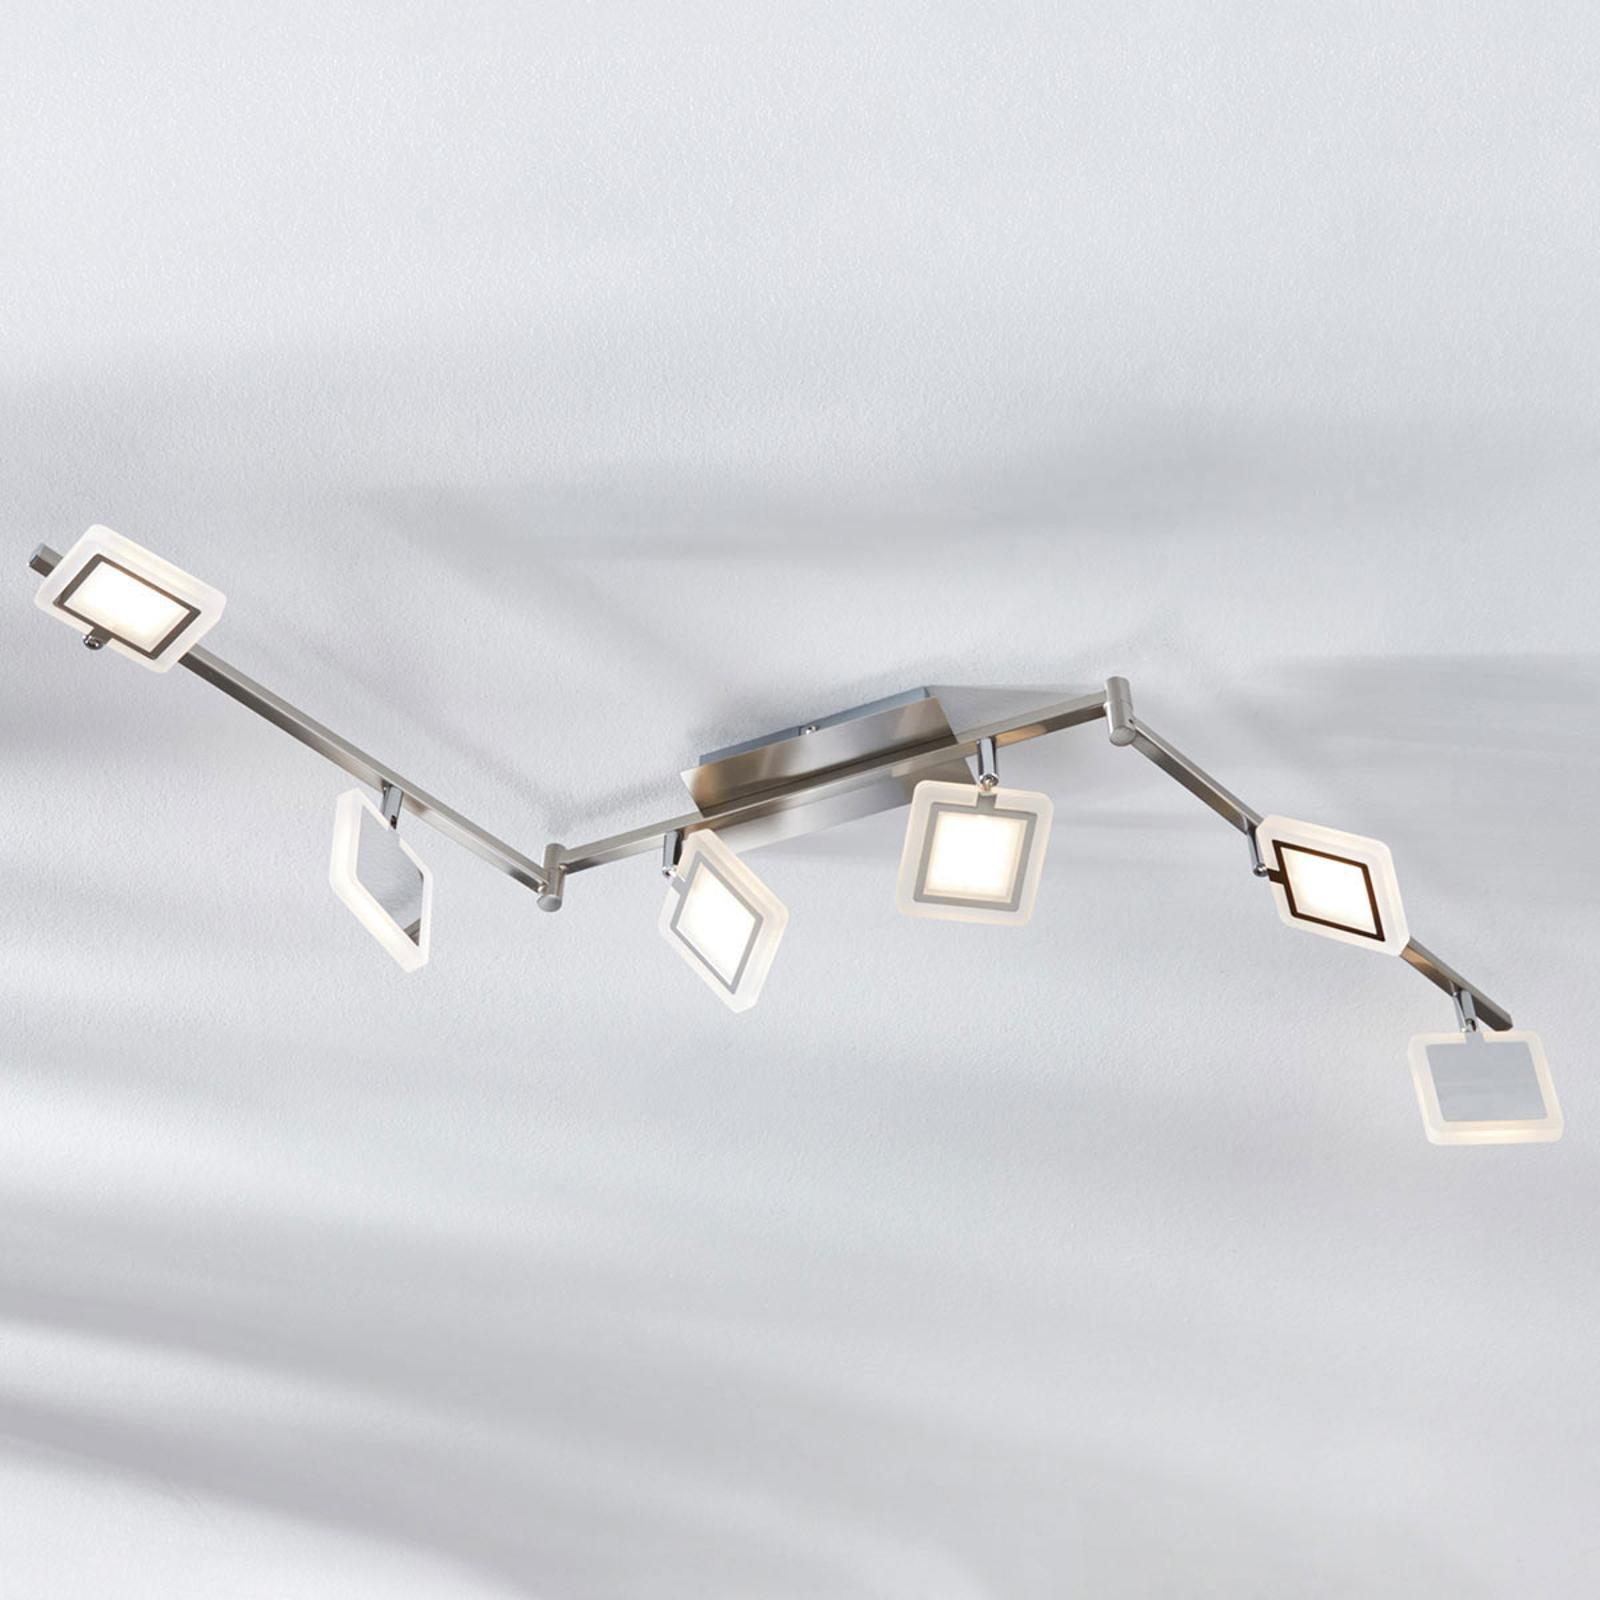 LED-Deckenstrahler Evelina, 6-flammig